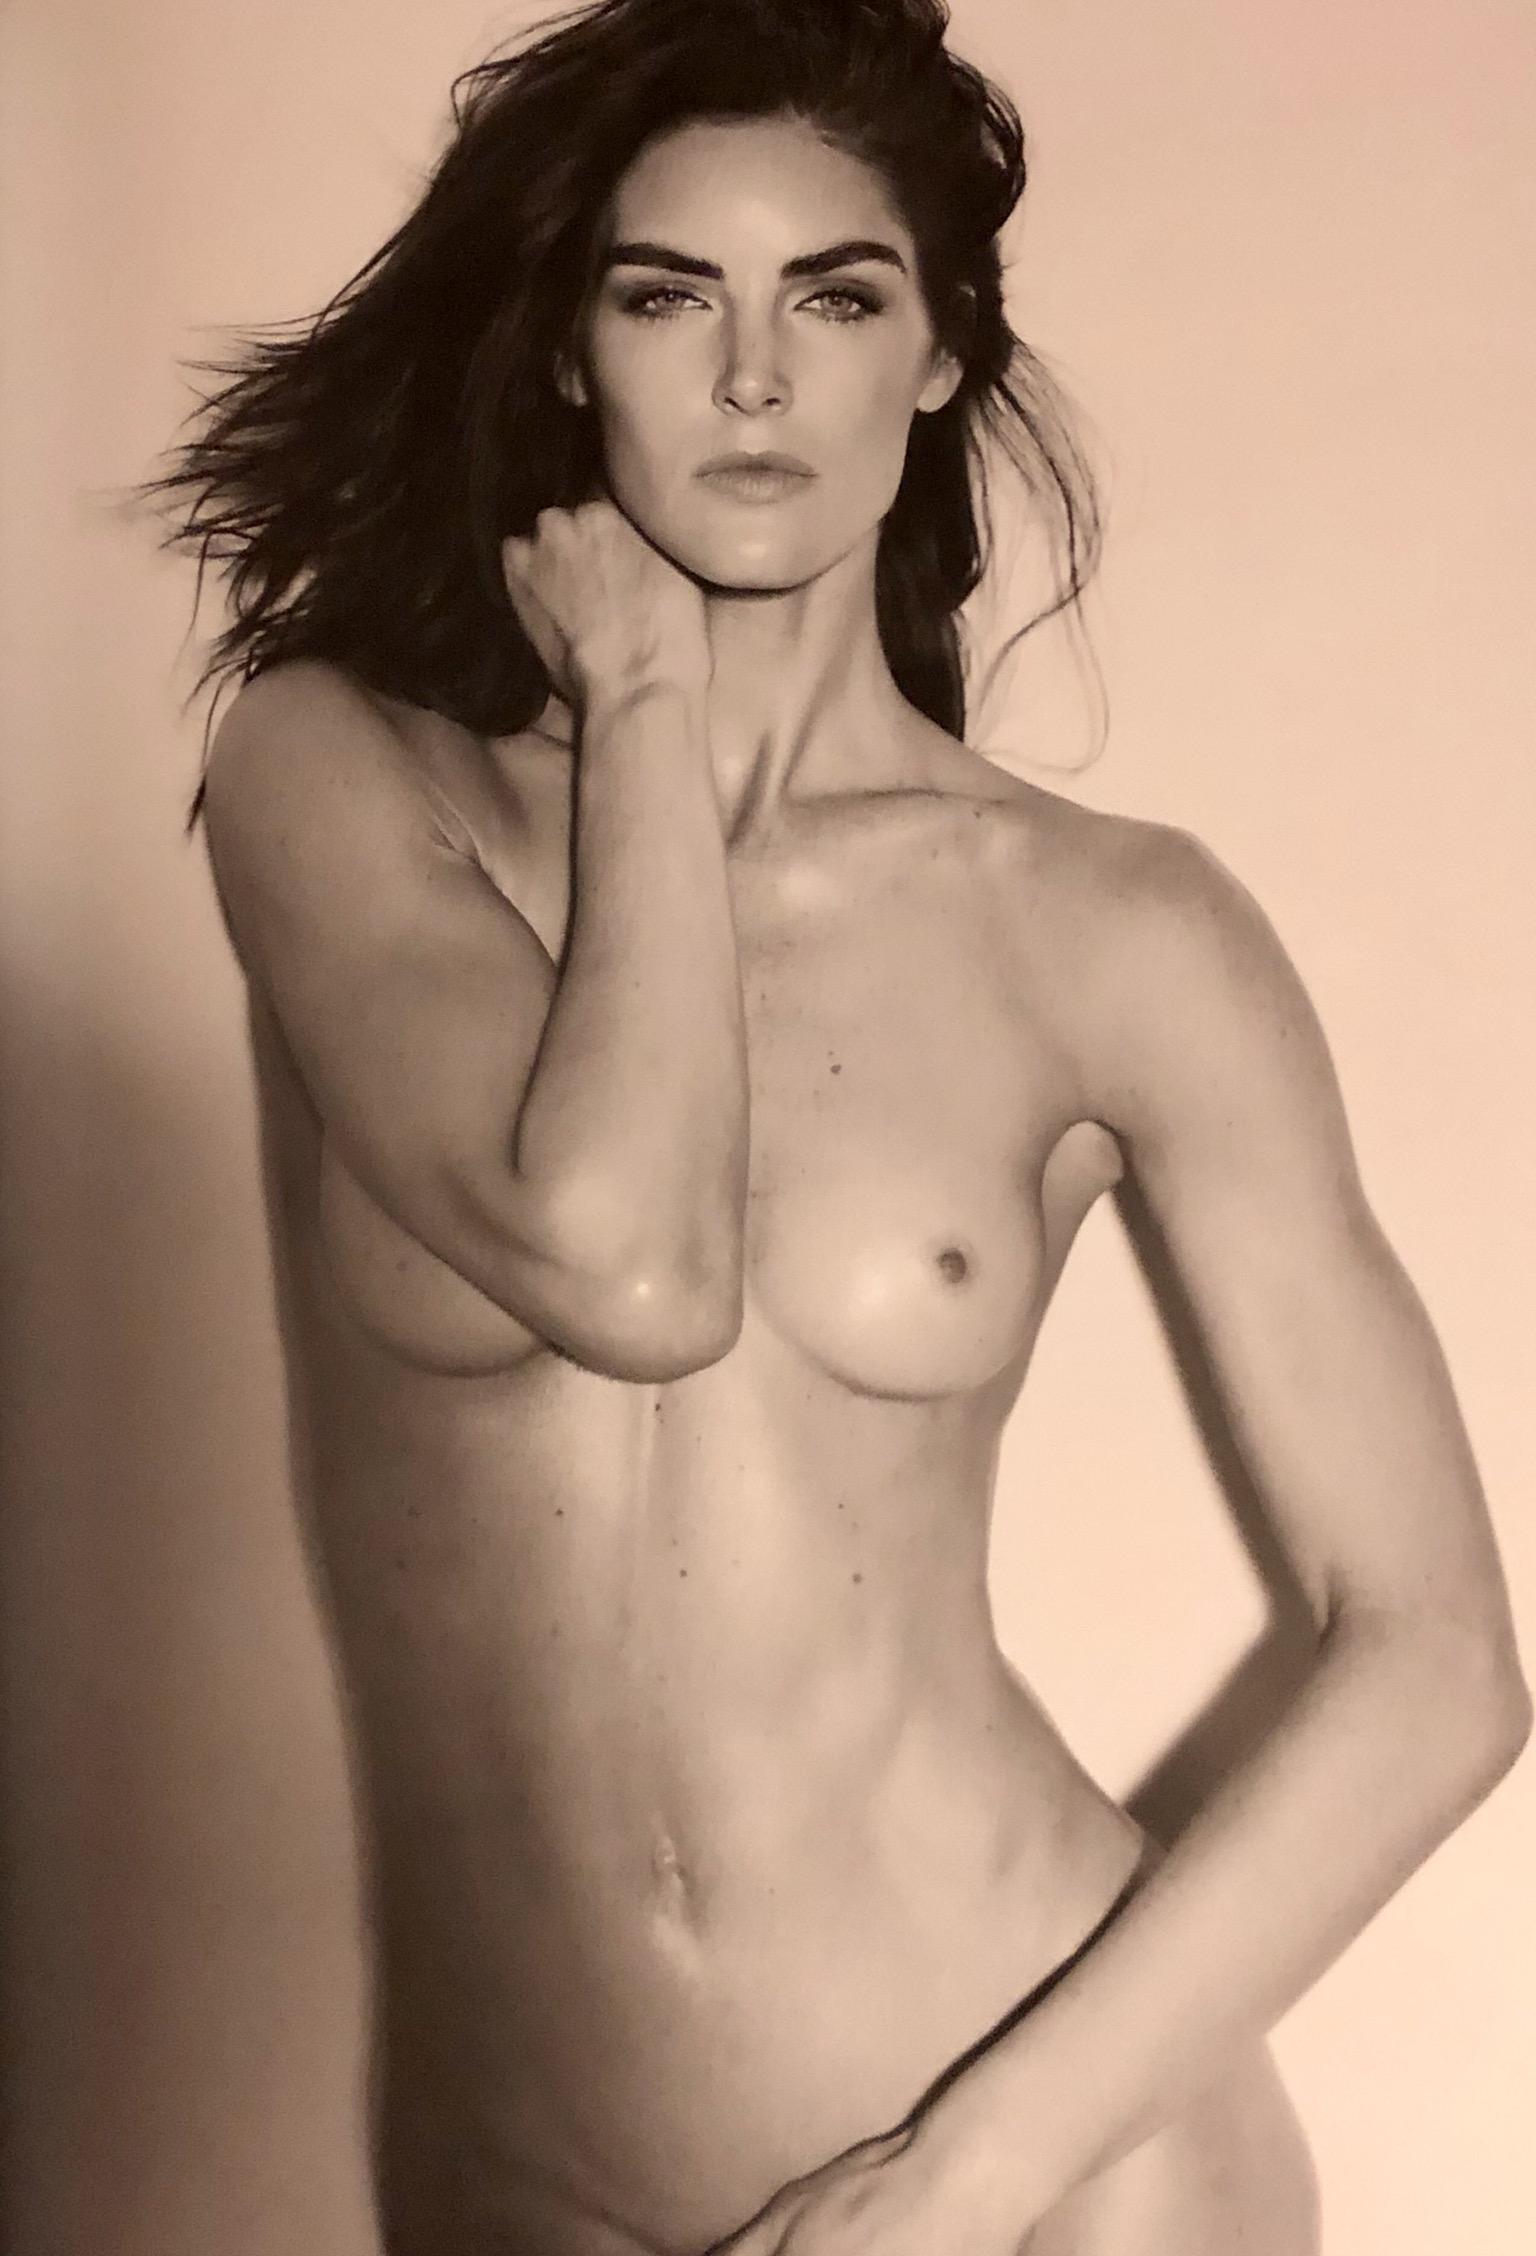 Swimwear Nude Pics Of Female Models Jpg